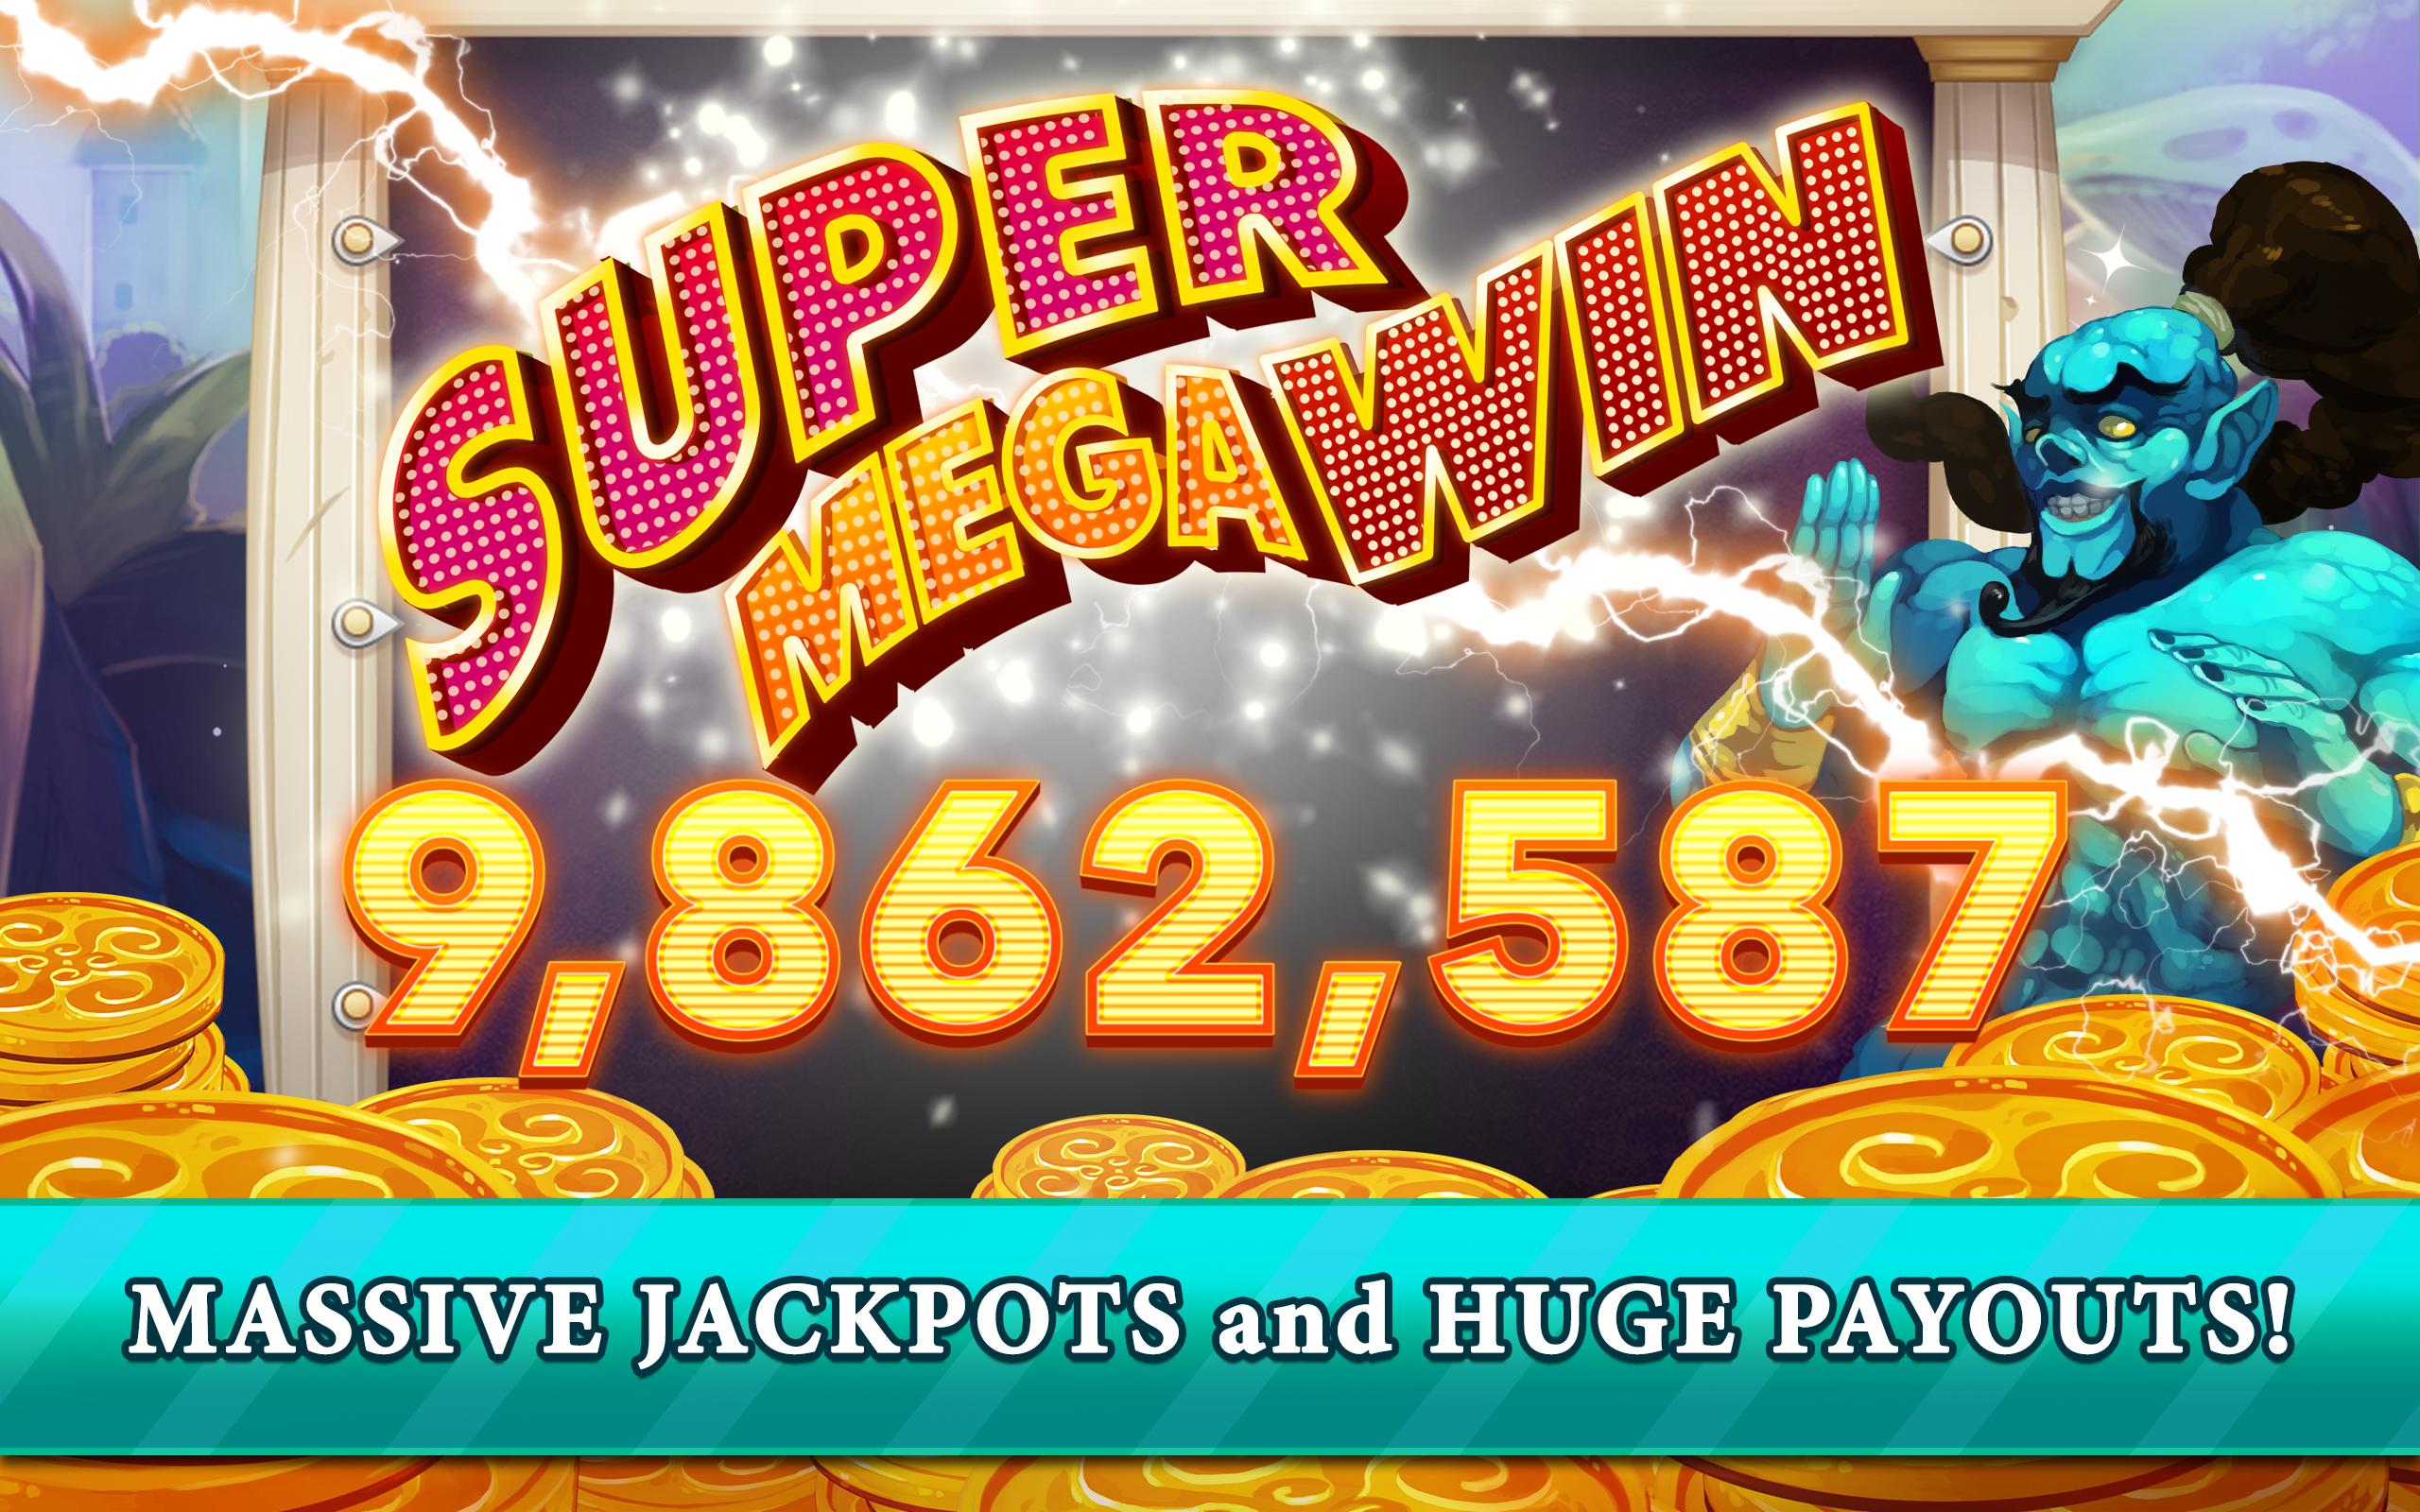 Win2day slots